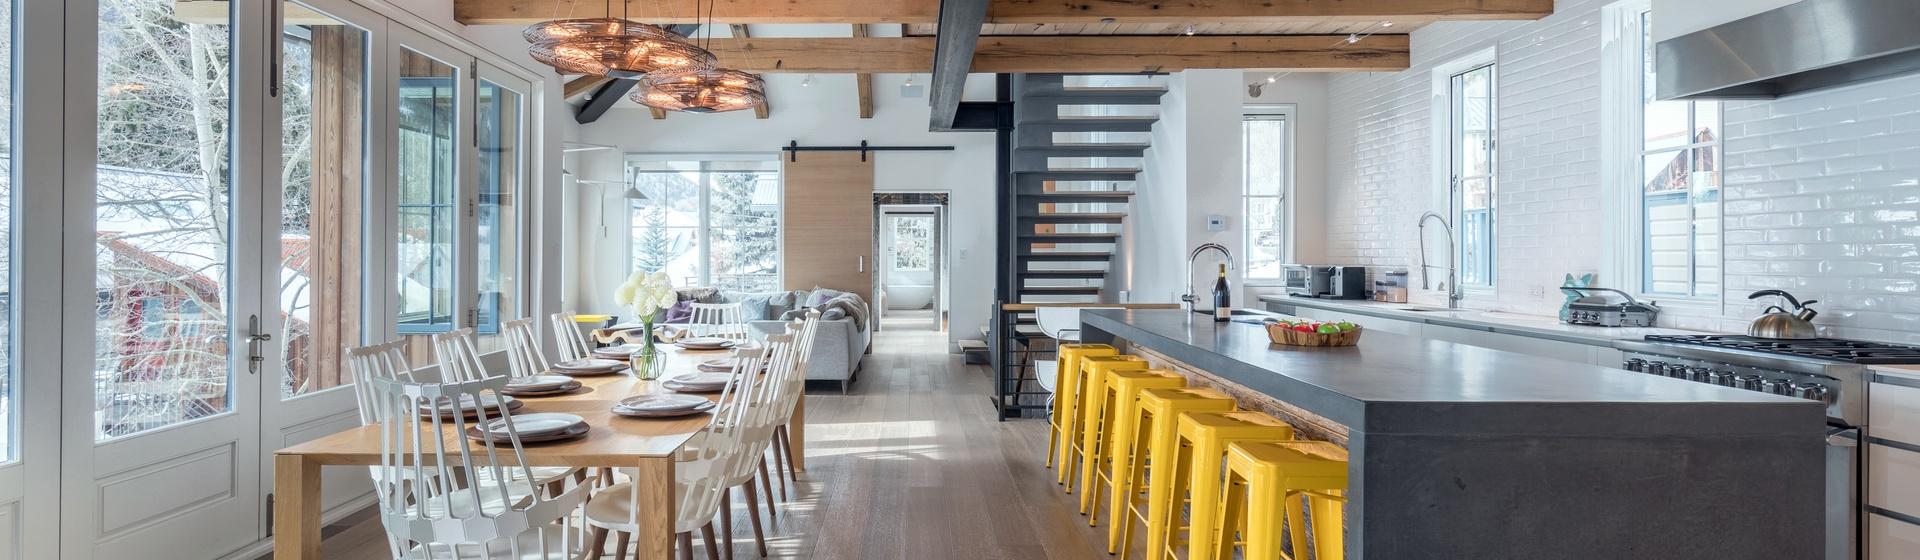 1-Telluride-The-Sunnyside-Kitchen-Dining-Wide-Web.jpg